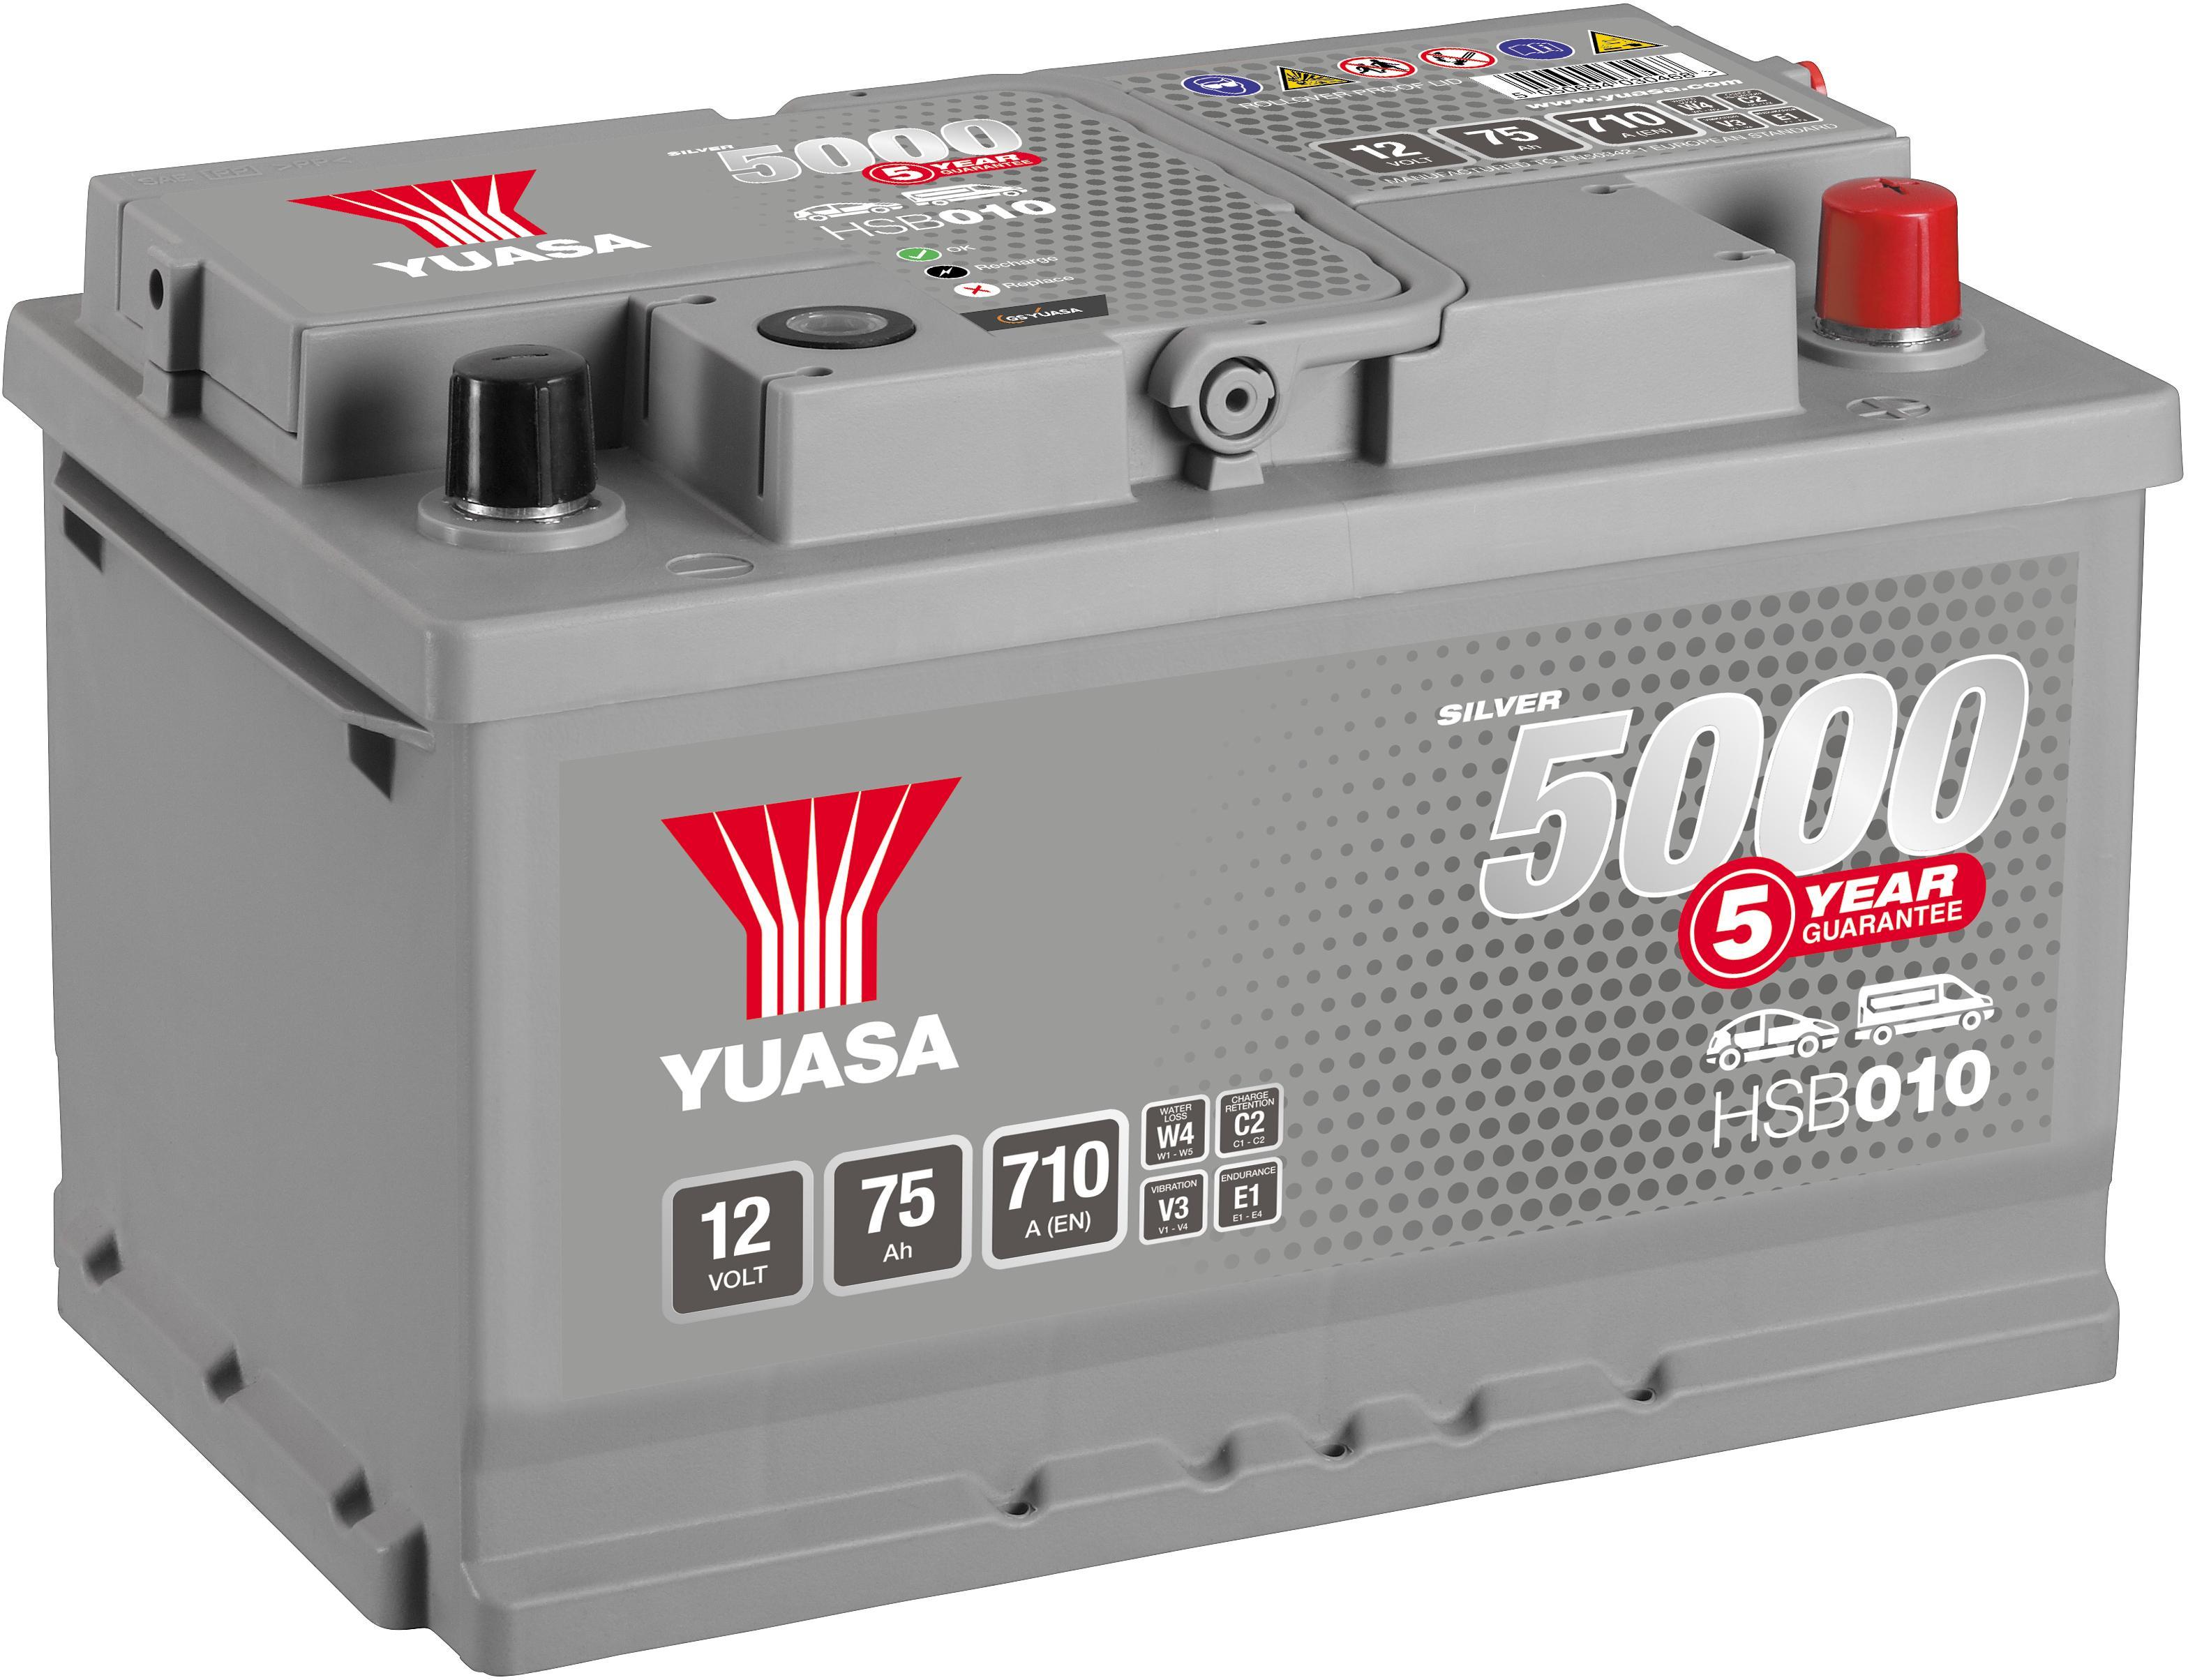 335 Titanium Car Battery 12V 91Ah - Kia Sportage, Mazda 3, 5, 6, Mitsubishi L200